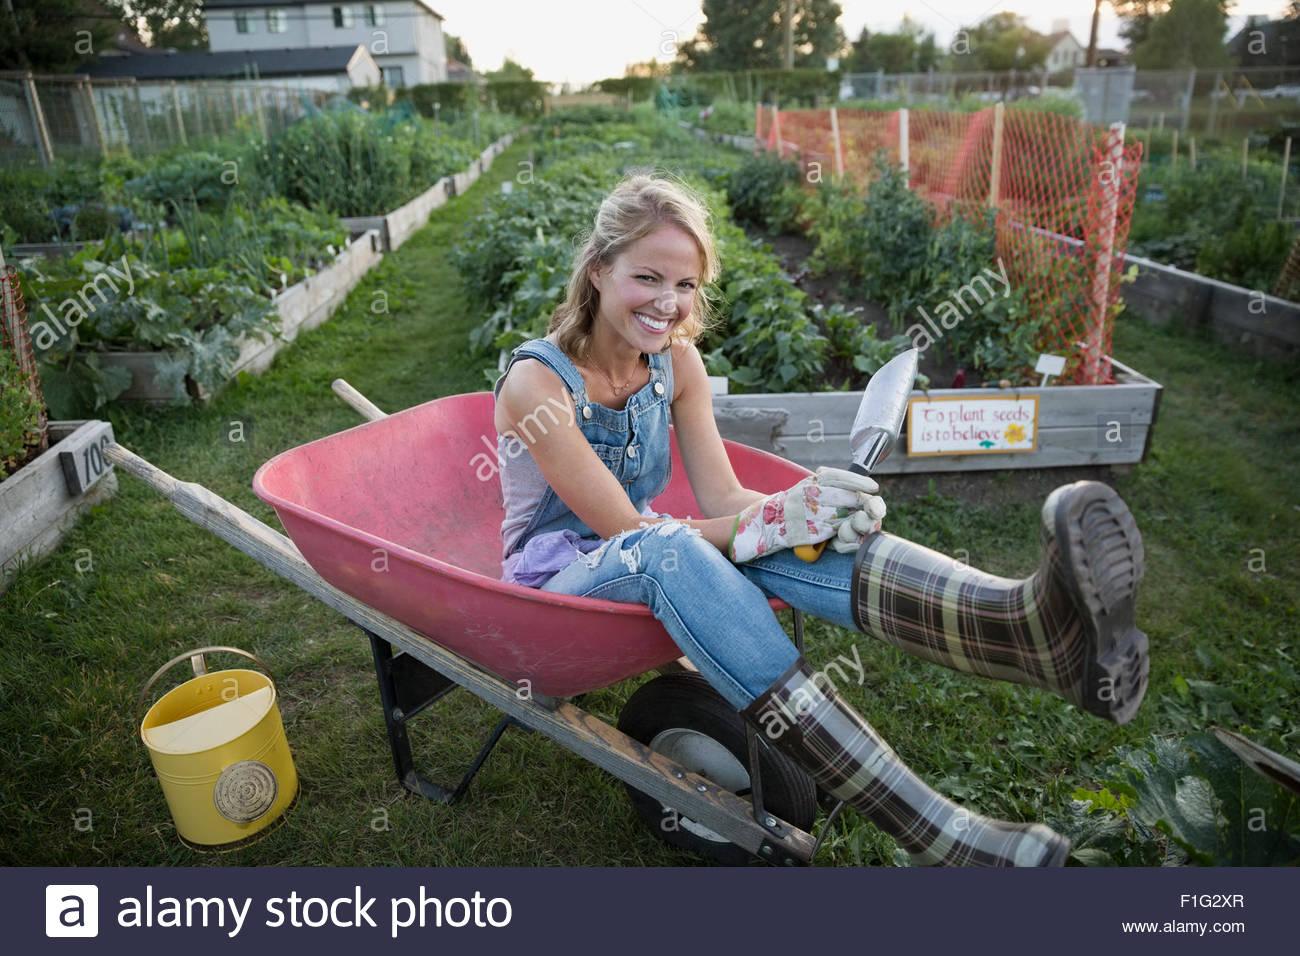 Mujer sentada wellingtons juguetona plaid carretilla jardín Imagen De Stock